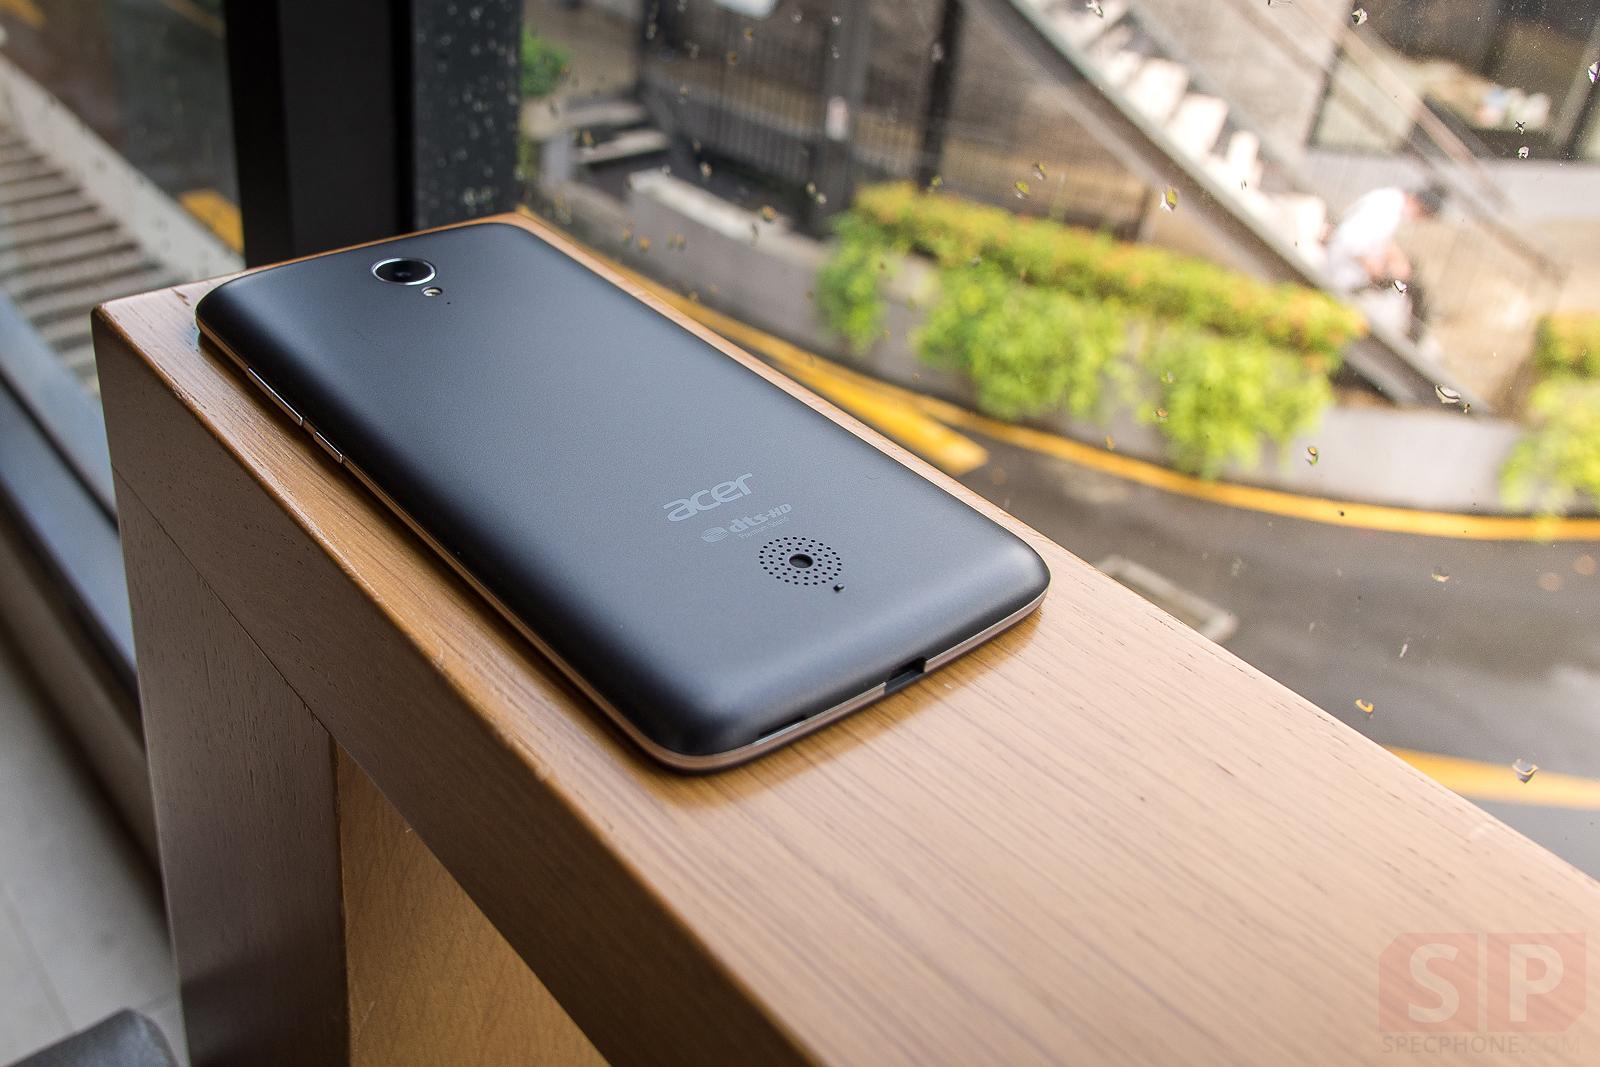 Review Acer Liquid Zest4G SpecPhone 161020 07